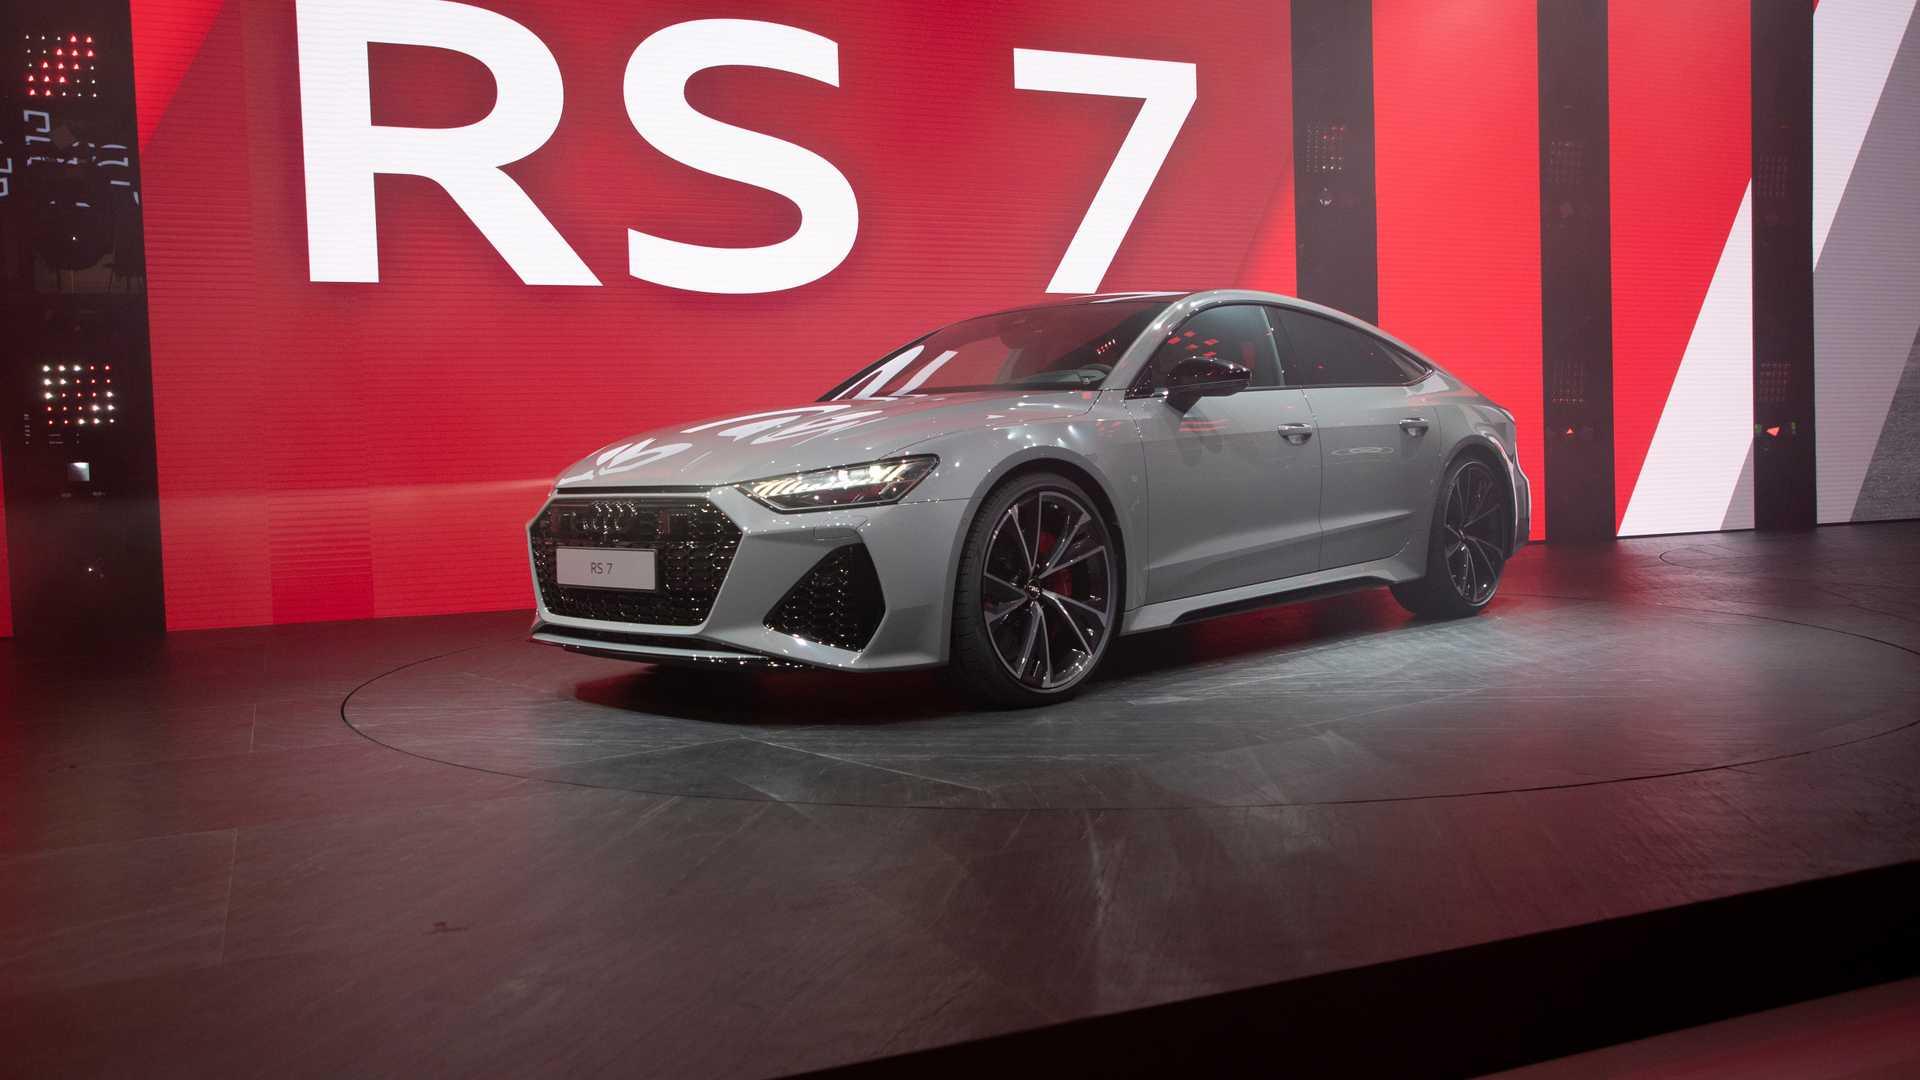 audi-rs7-sportback-2020-tai-frankfurt-motor-show-2019-Xetot-com-6